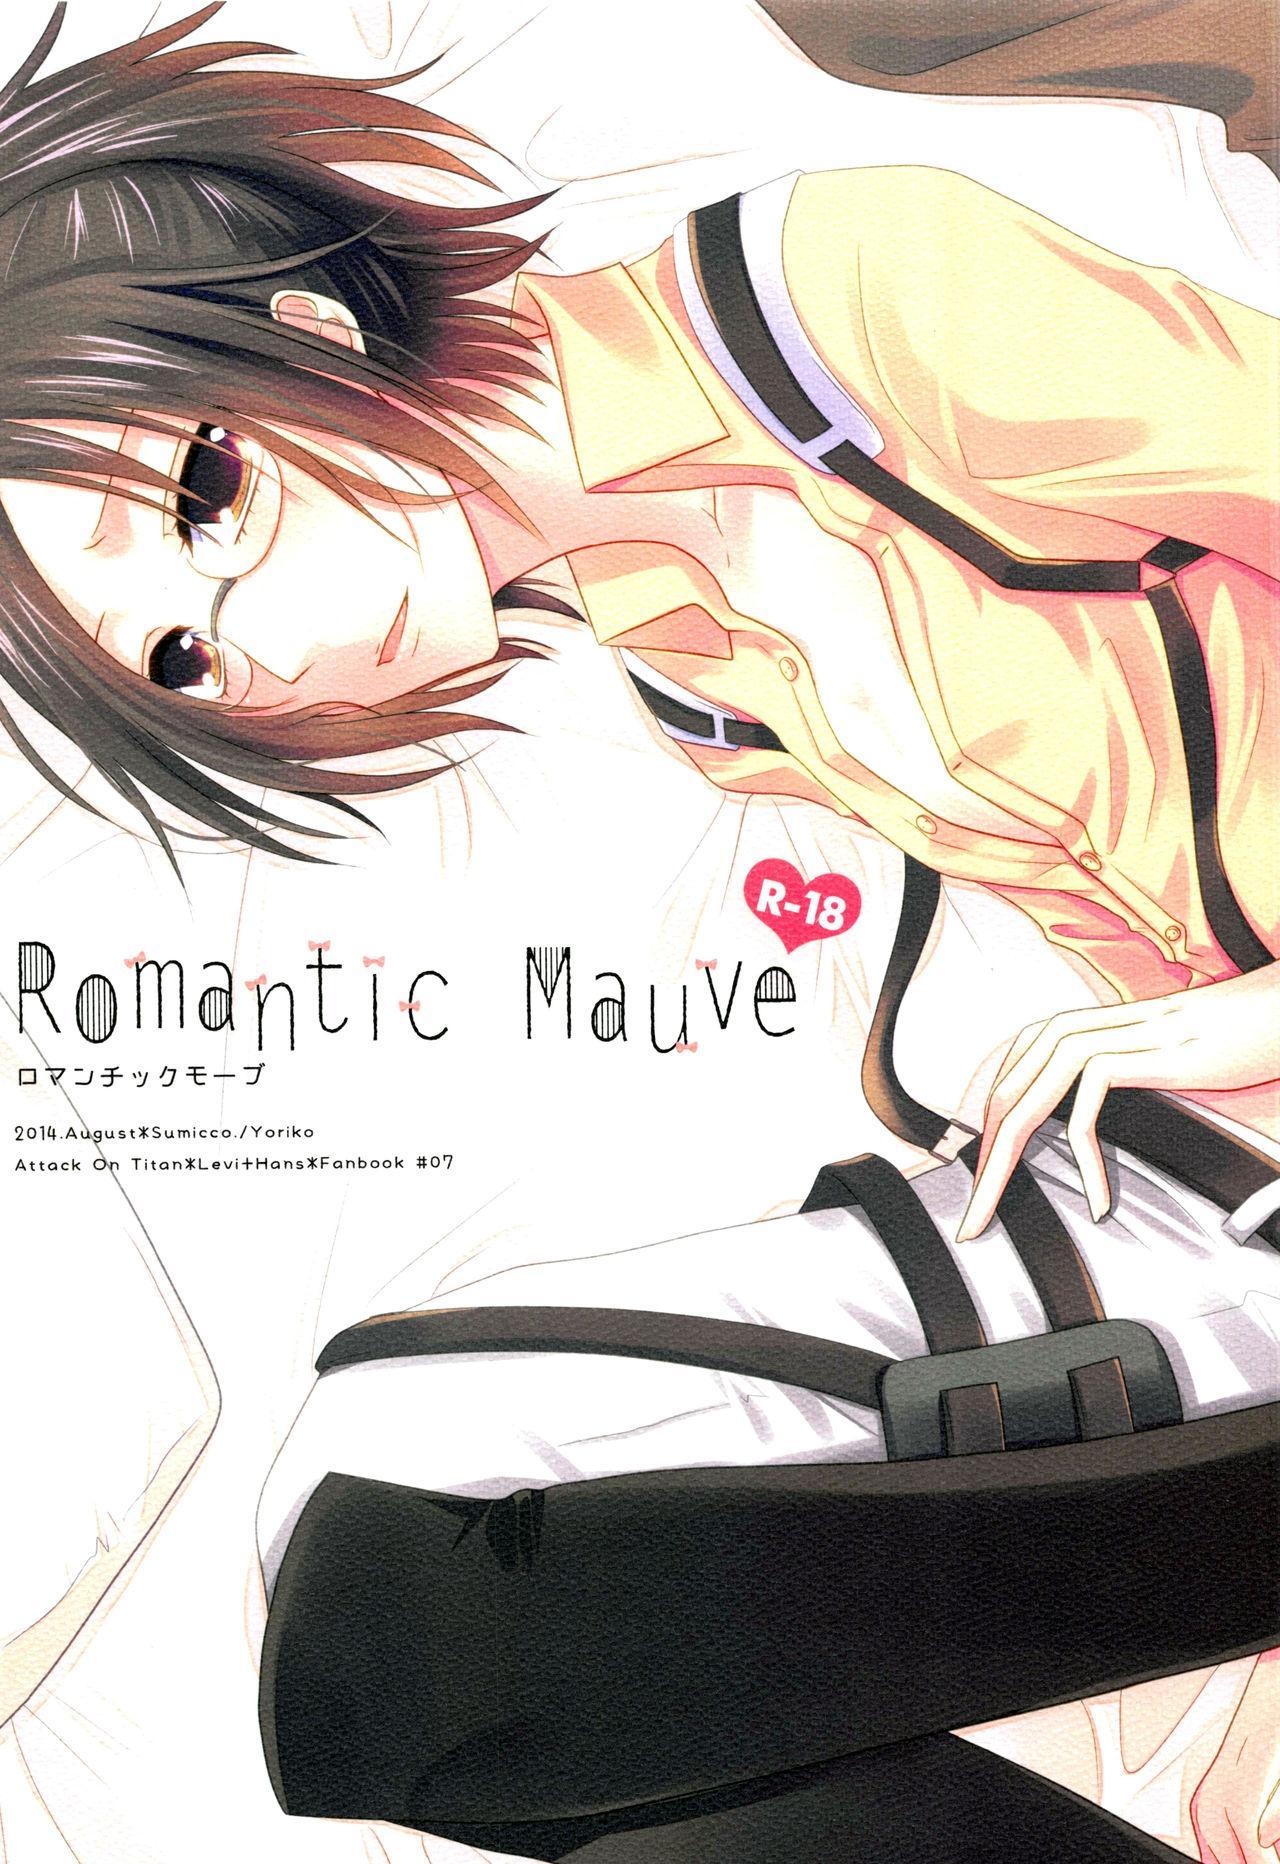 Romantic Mauve 0